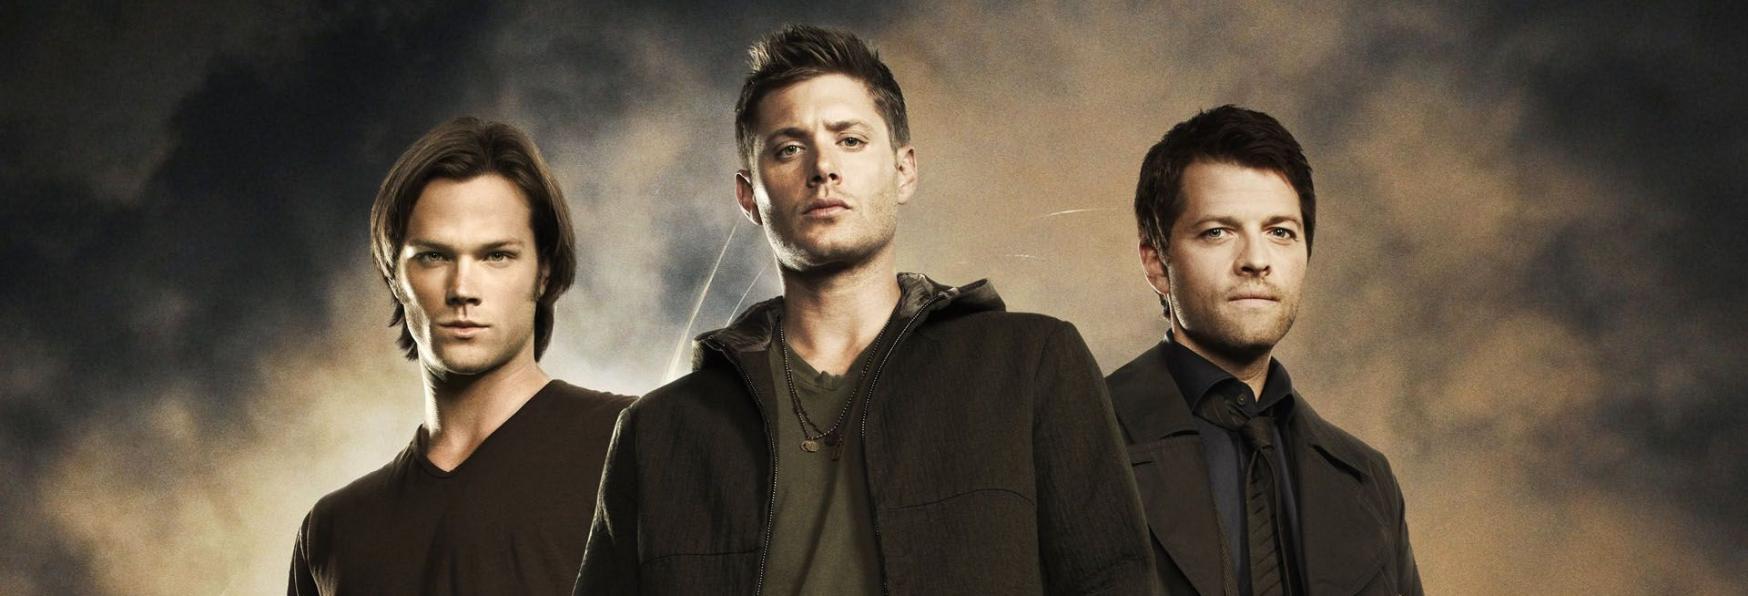 Le Serie TV Supernatural e The 100 sono Sospese a causa del Coronavirus